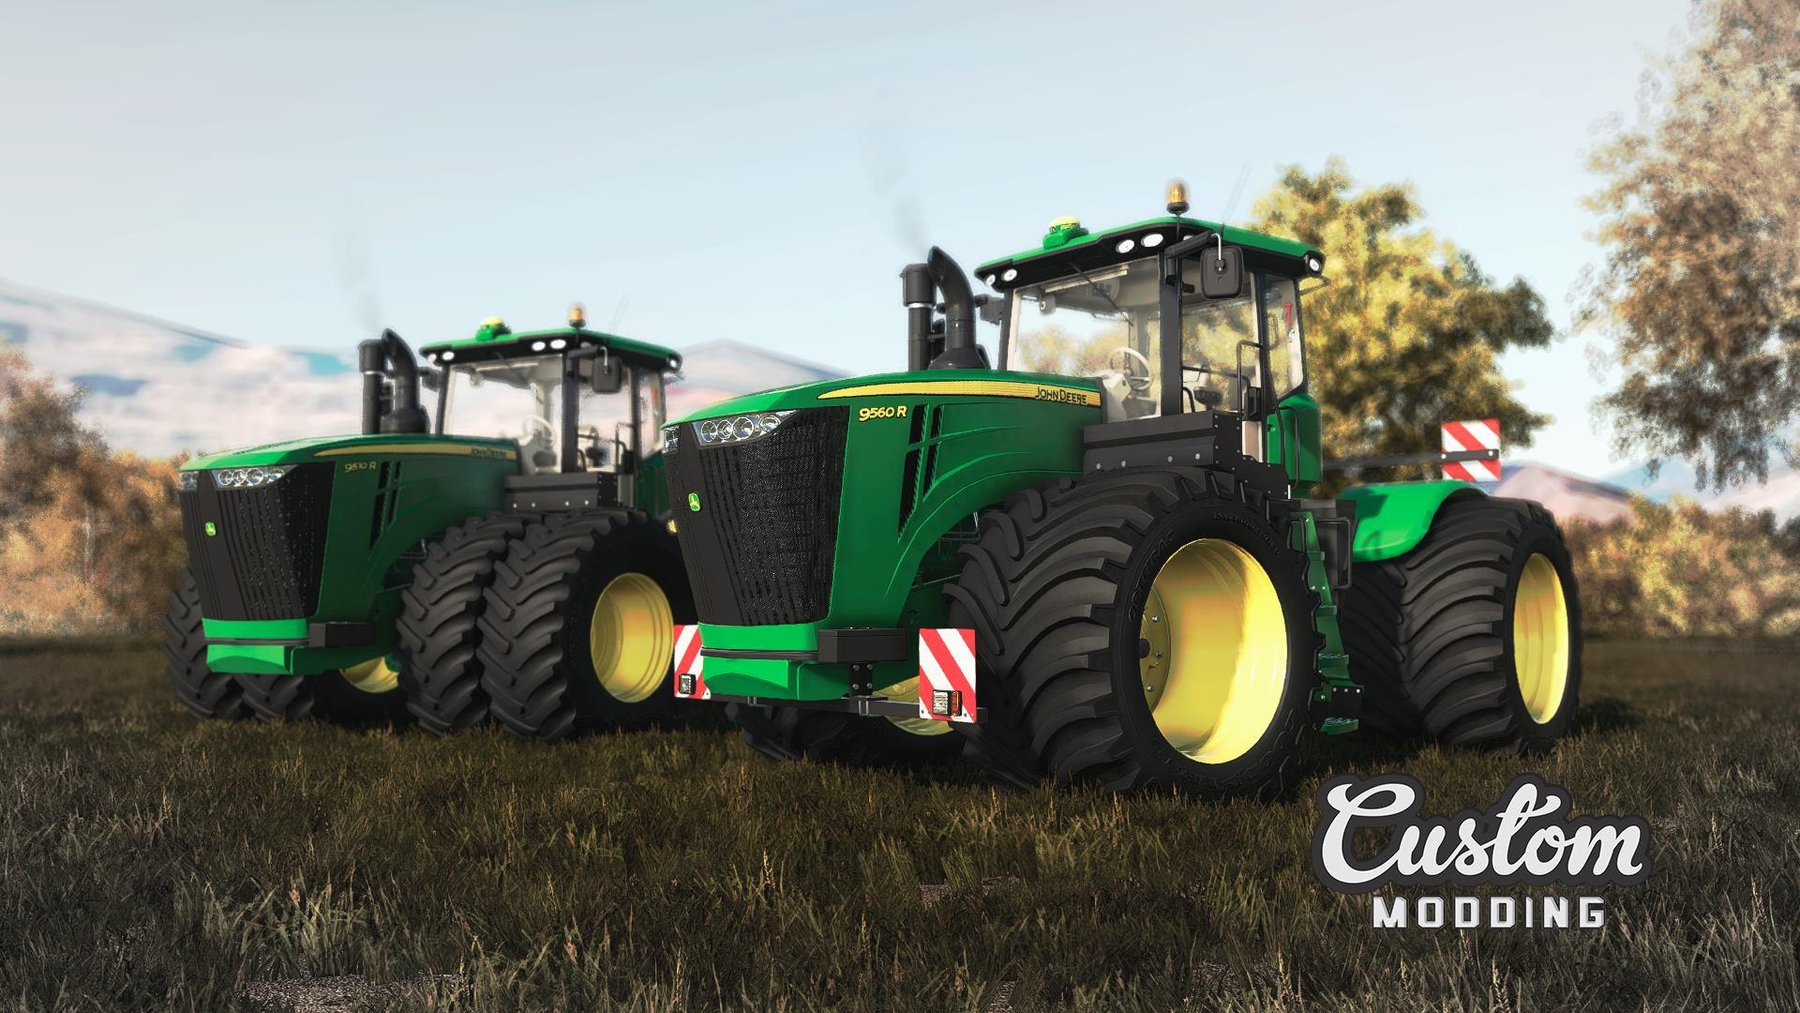 Car Mechanic Simulator 2018 Mods Mods For Games >> John Deere 9R 2014 Series v2.0.0.0 - FS 19 Tractors ...